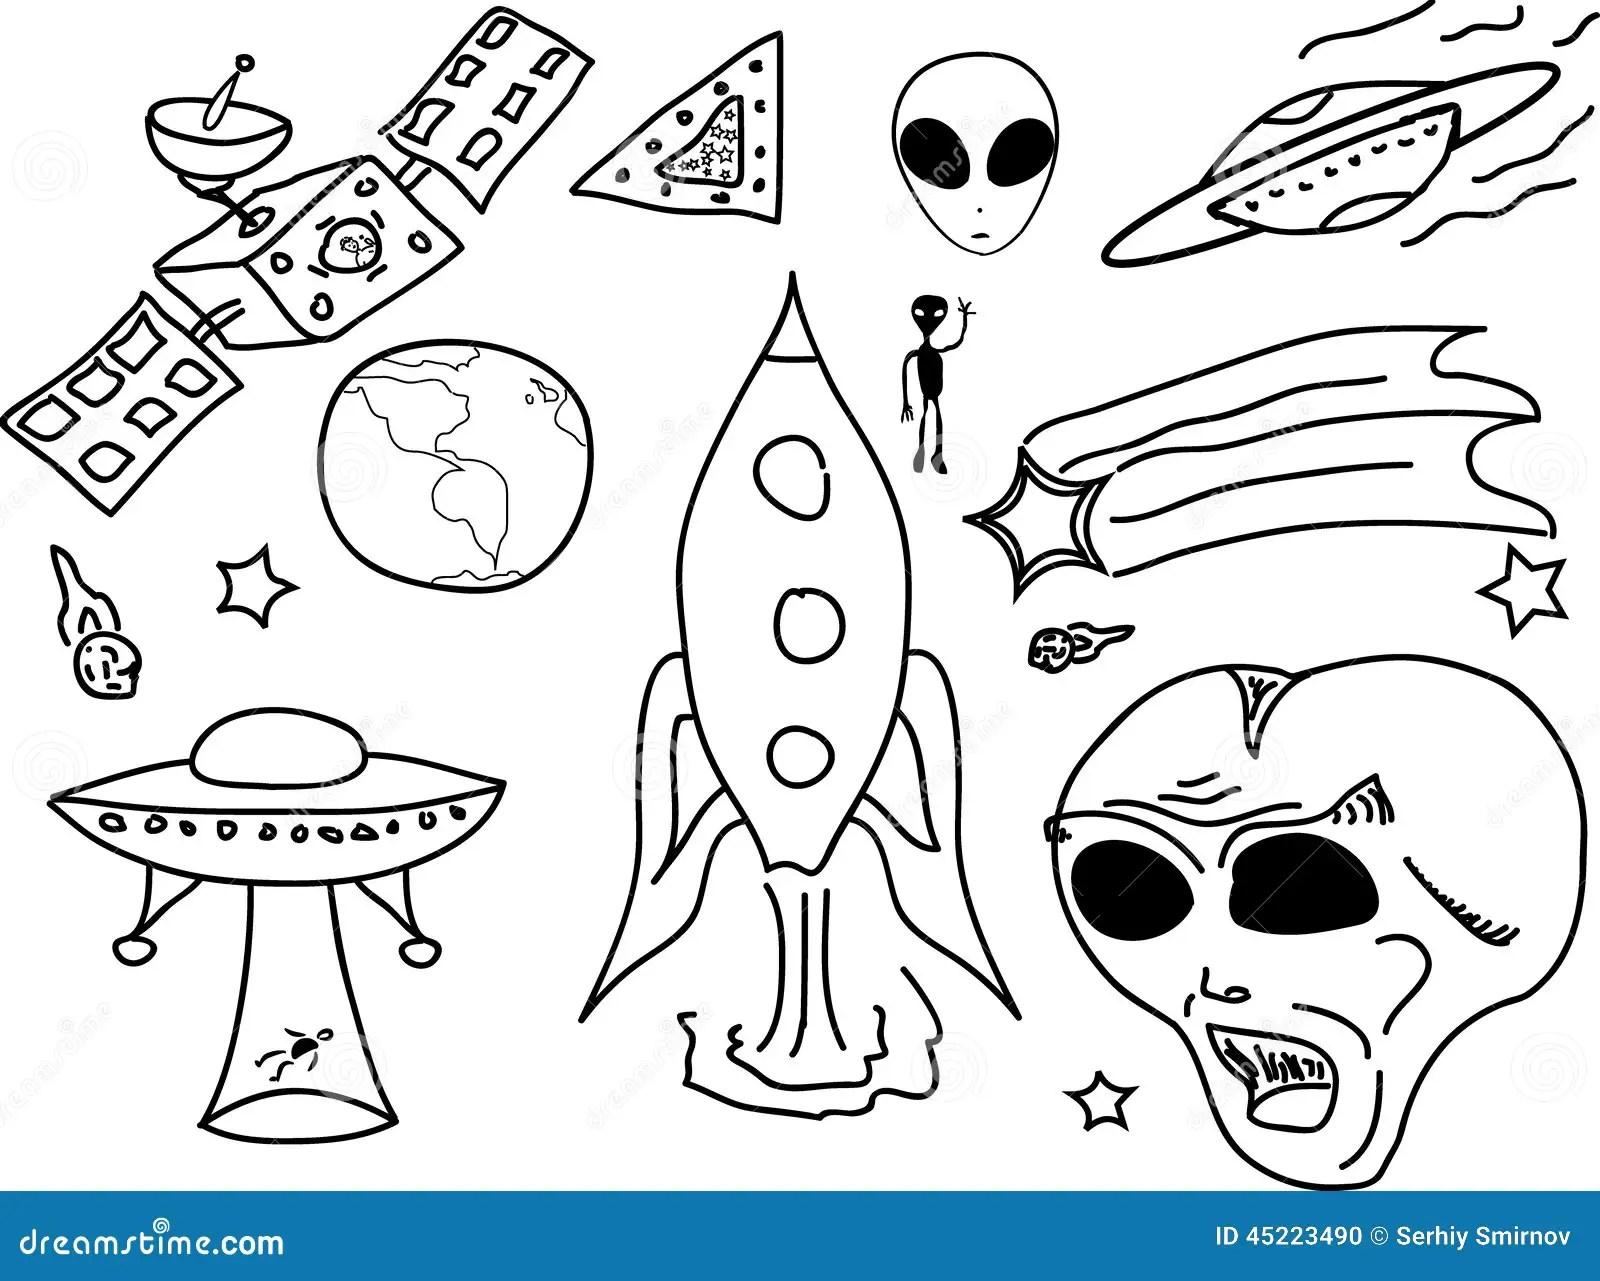 Ufo Doodle Cartoon Stock Vector Illustration Of Doodle